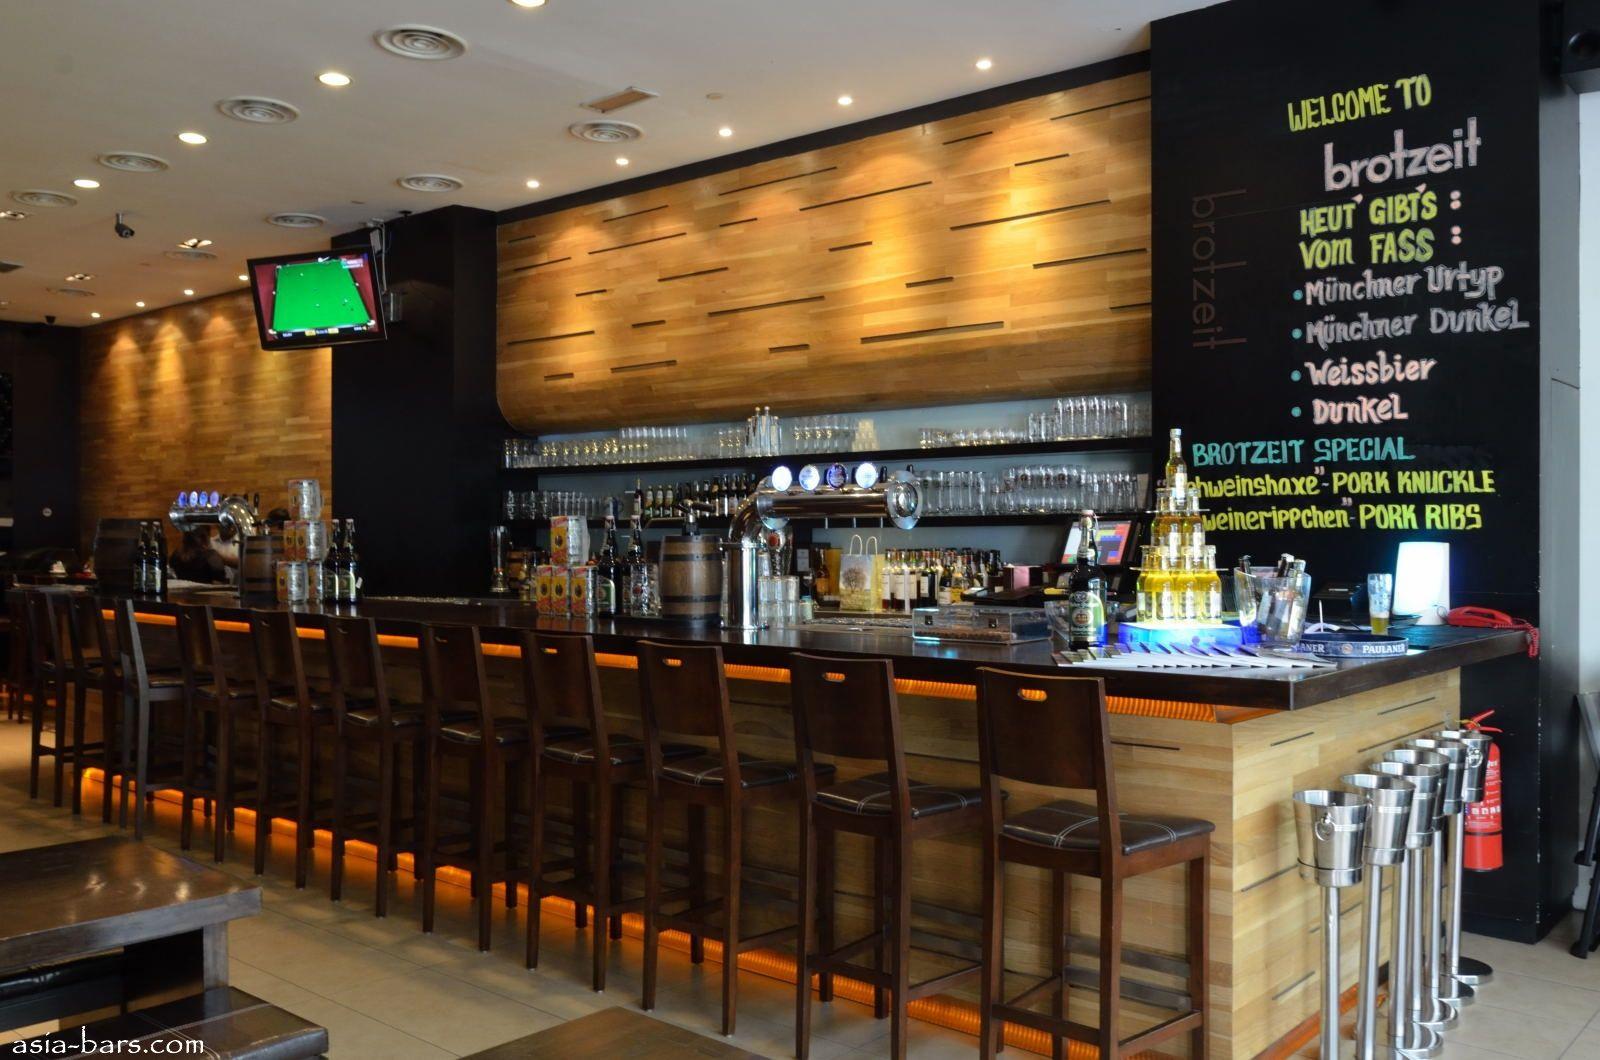 Elegant Amazing European Bar And Restaurant Interior With Wall Menu Idea κρασοθηκες  στην ακρη συνδυασμός με θέση